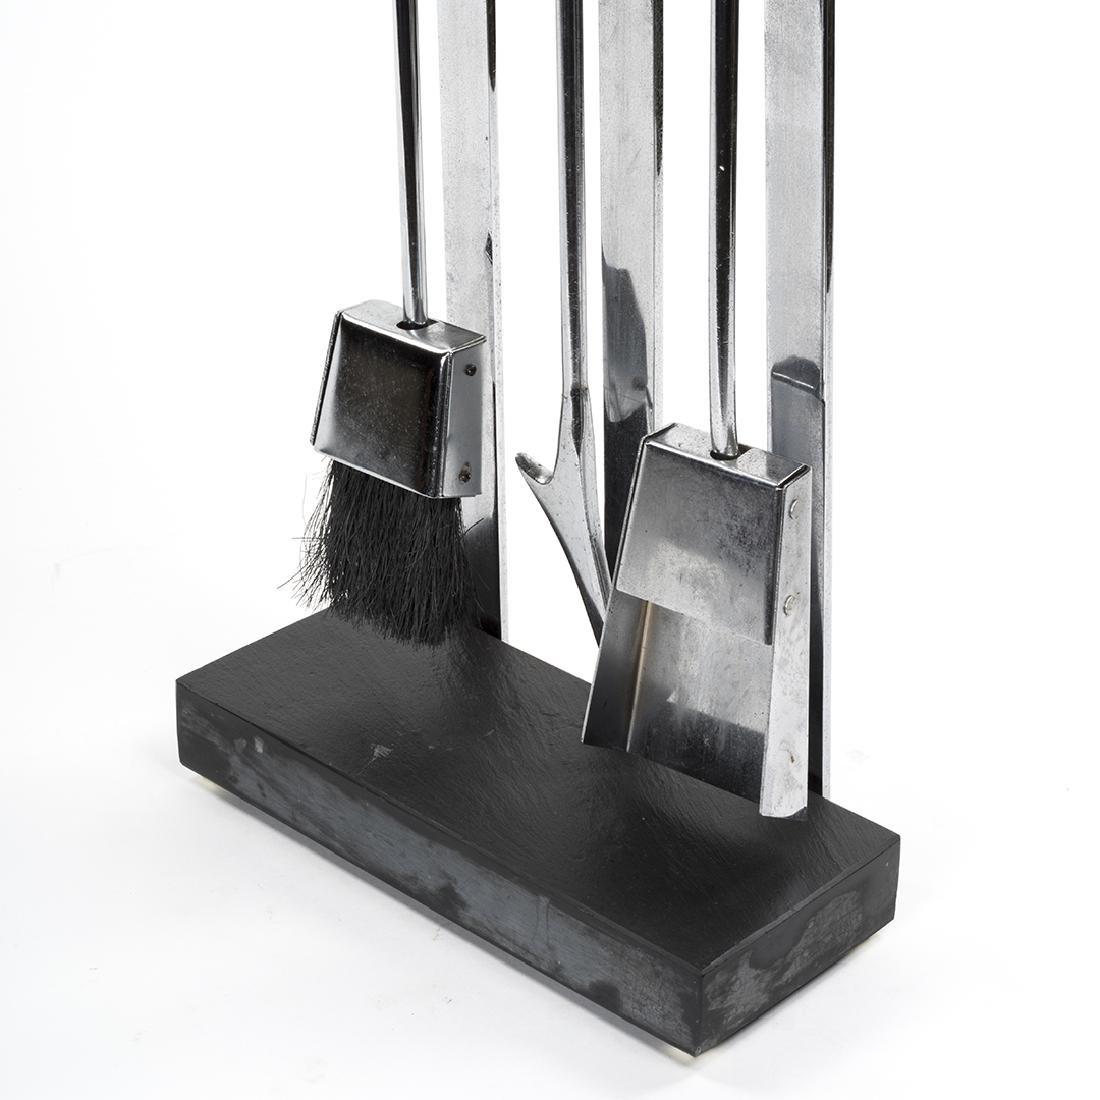 Albrizzi Fire Tools - 2